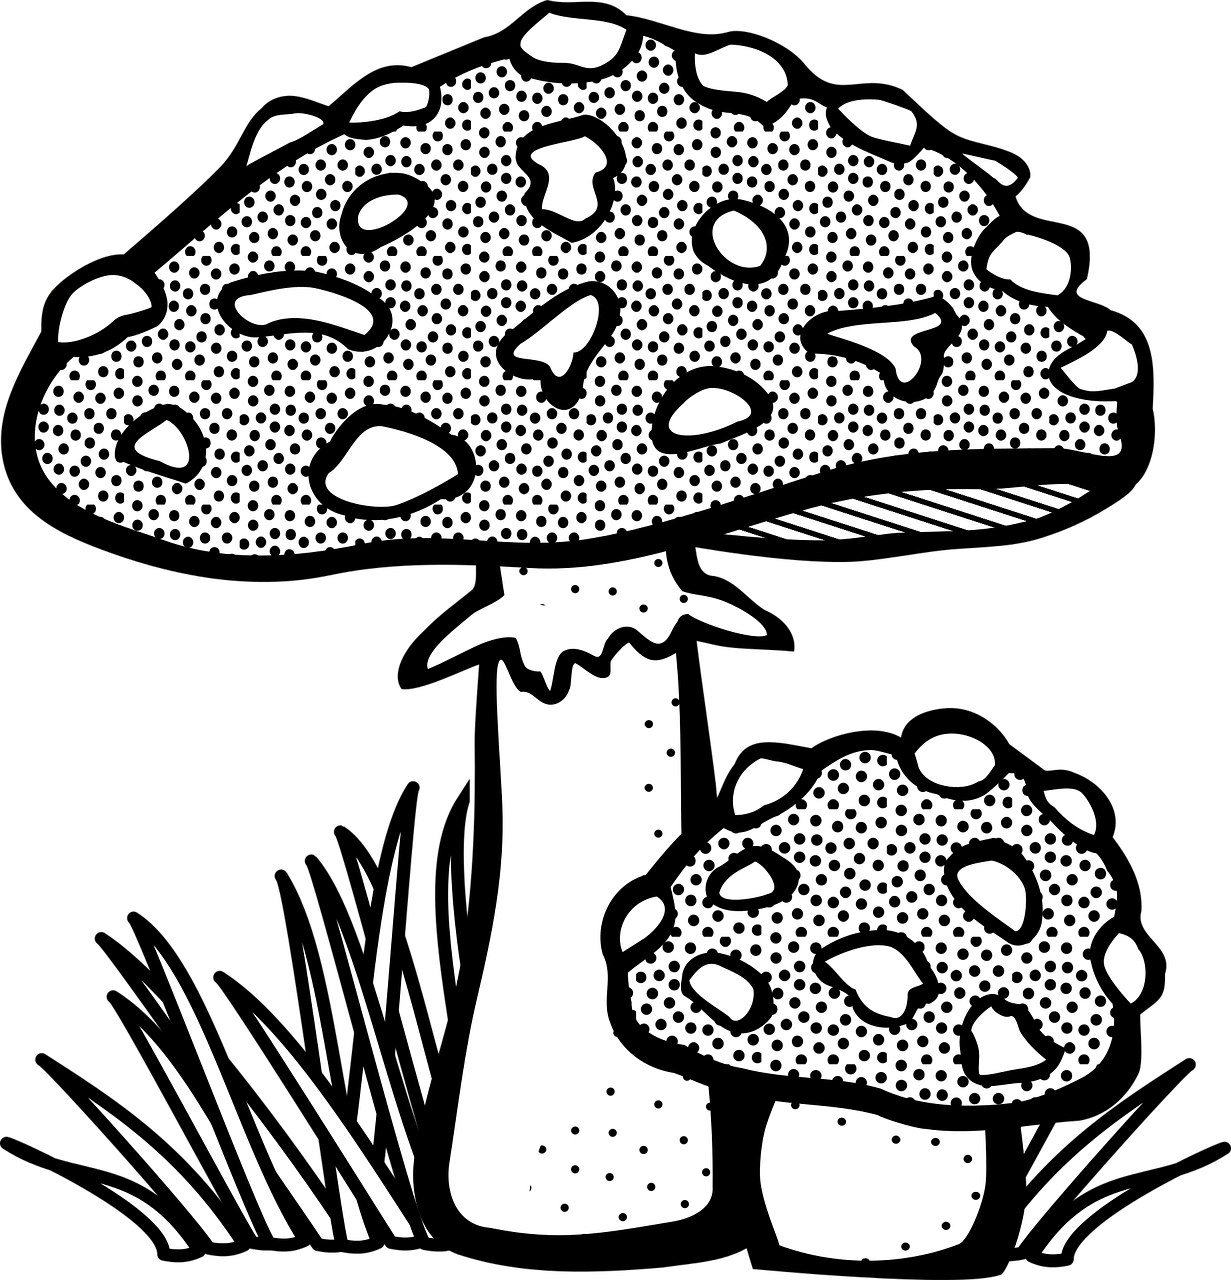 Mushrooms Clipart Line Drawing Mushrooms Line Drawing